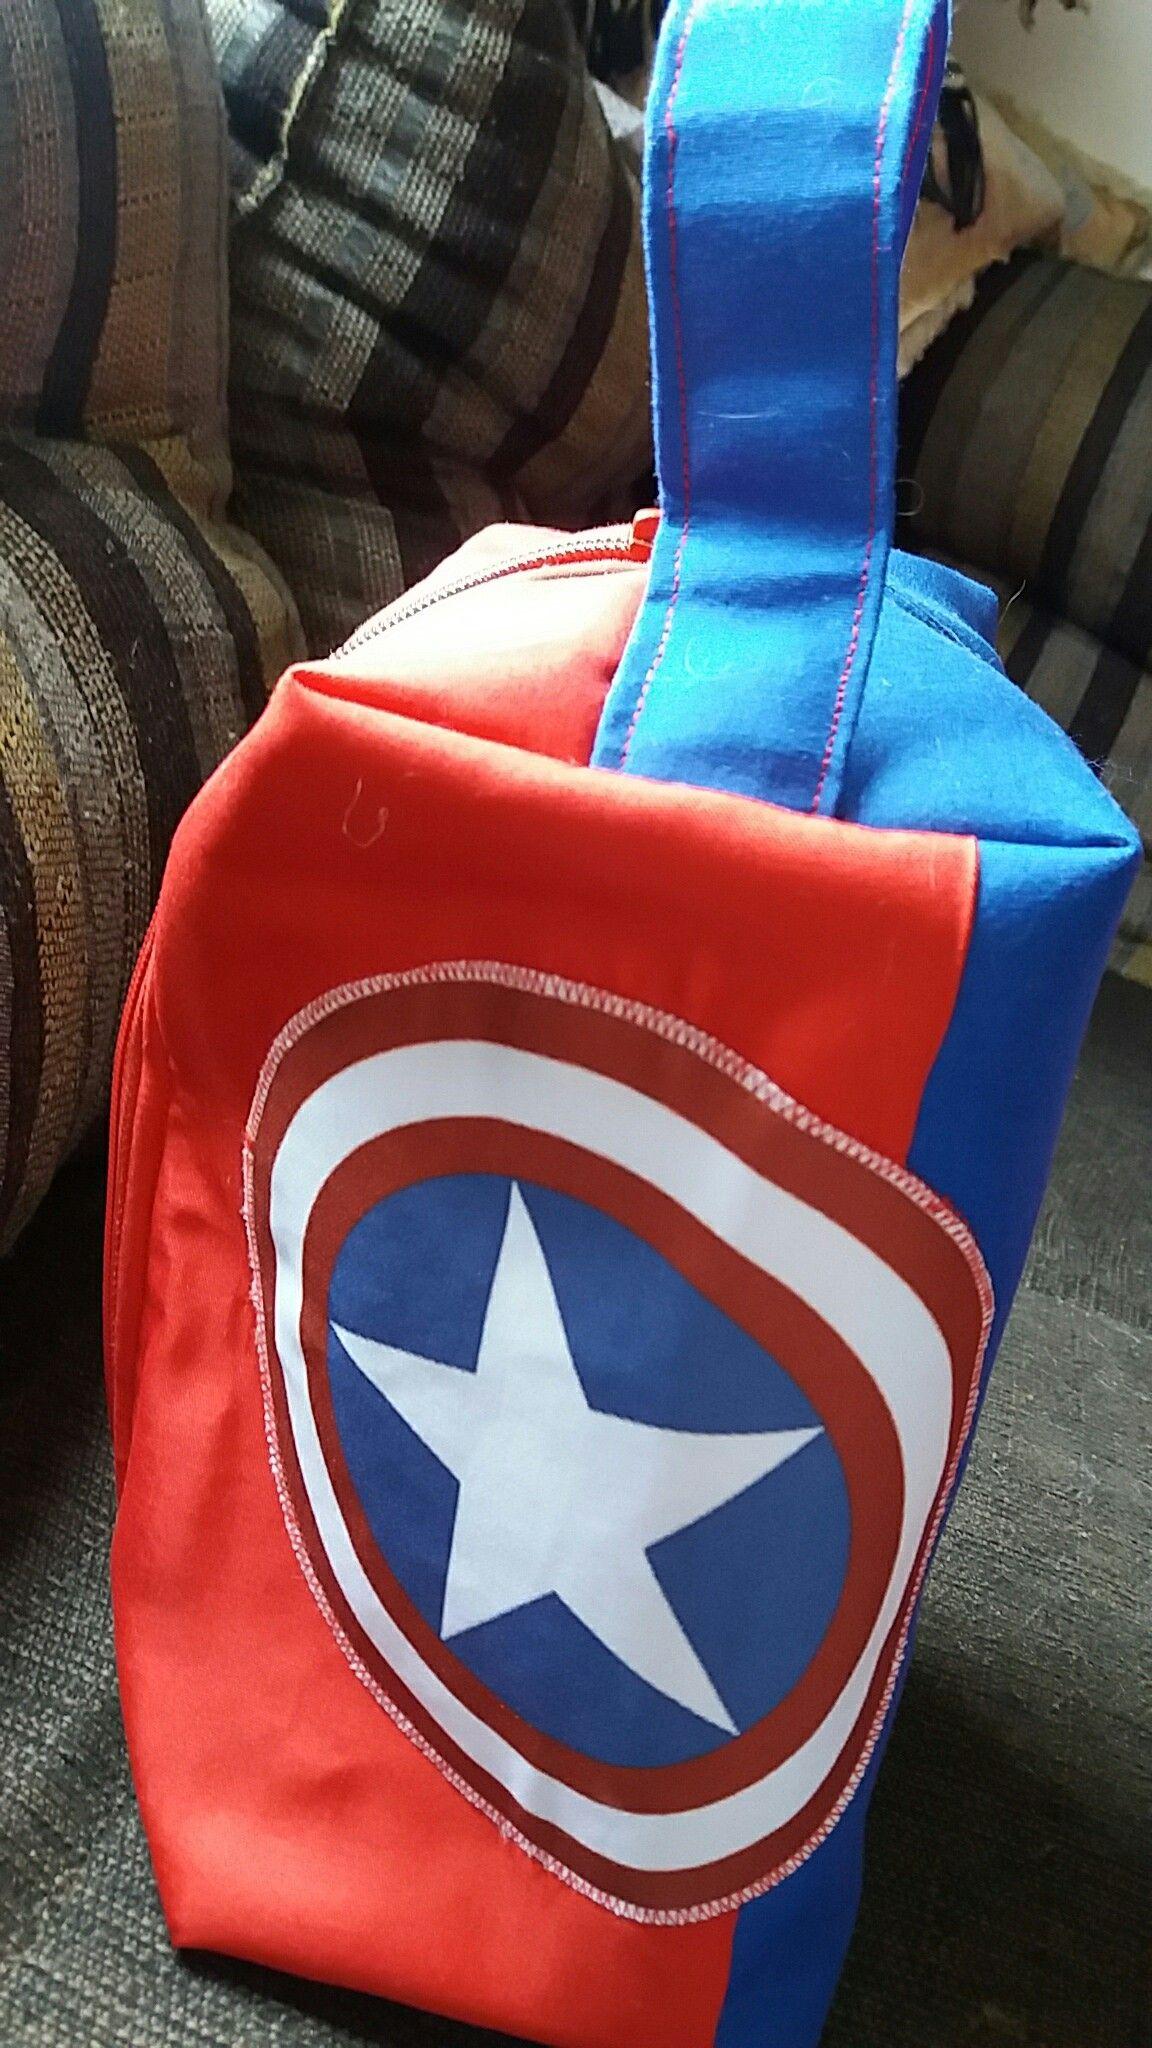 Necessárie infantil temática Super Heróis.